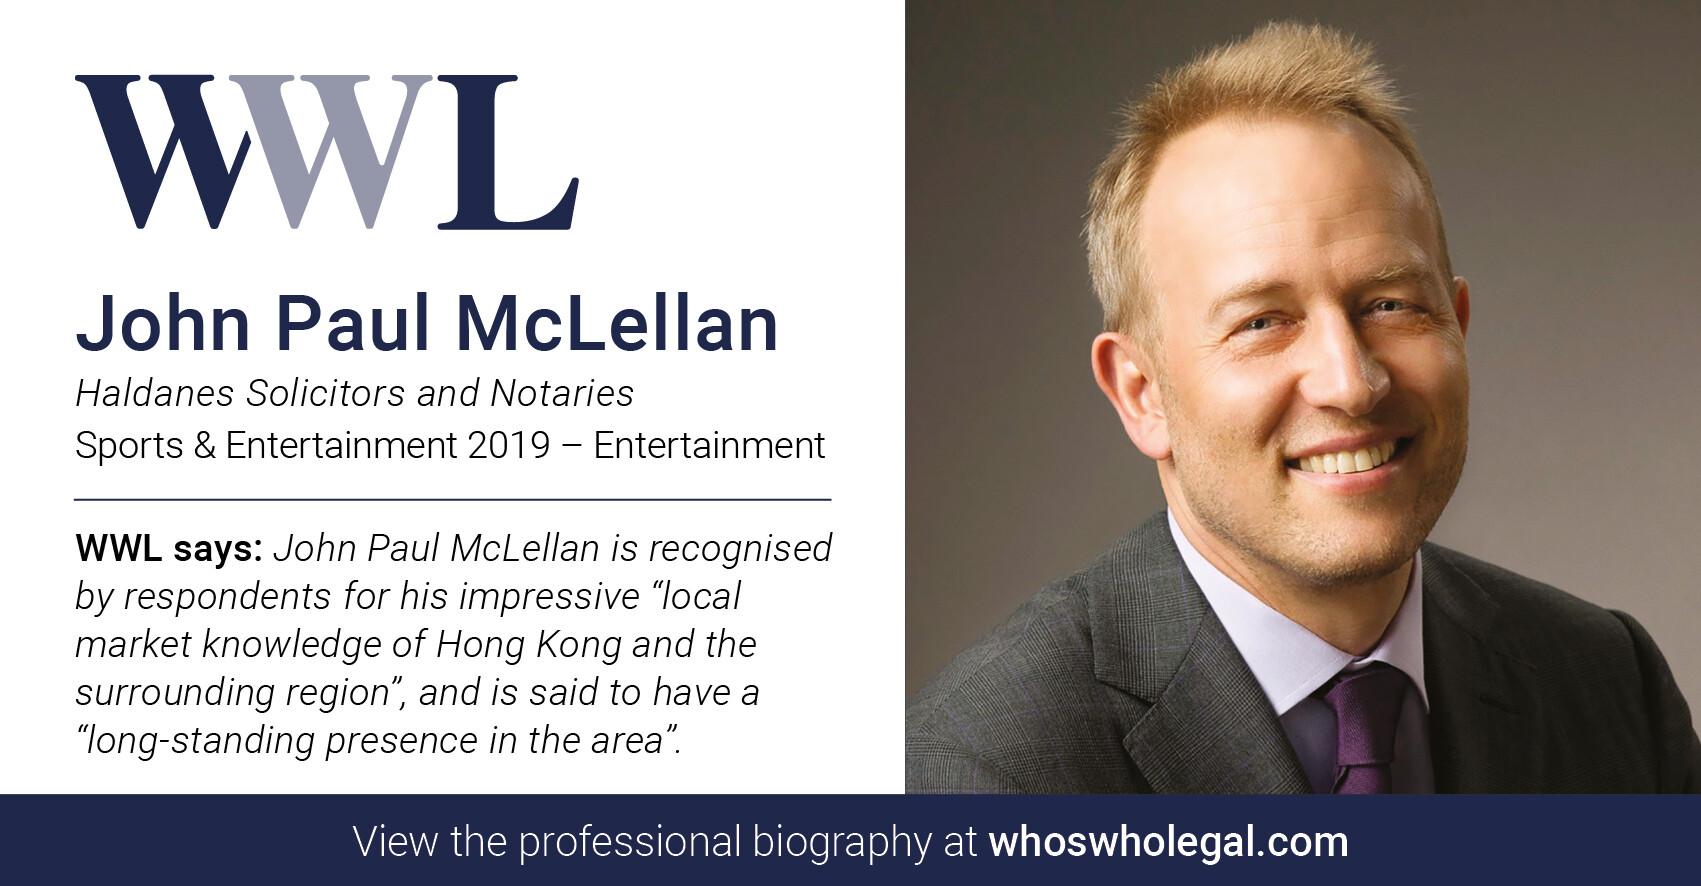 WWL John McLellan - 何敦律師行入選「法律名人錄2019 – 體育及娛樂事業律師」